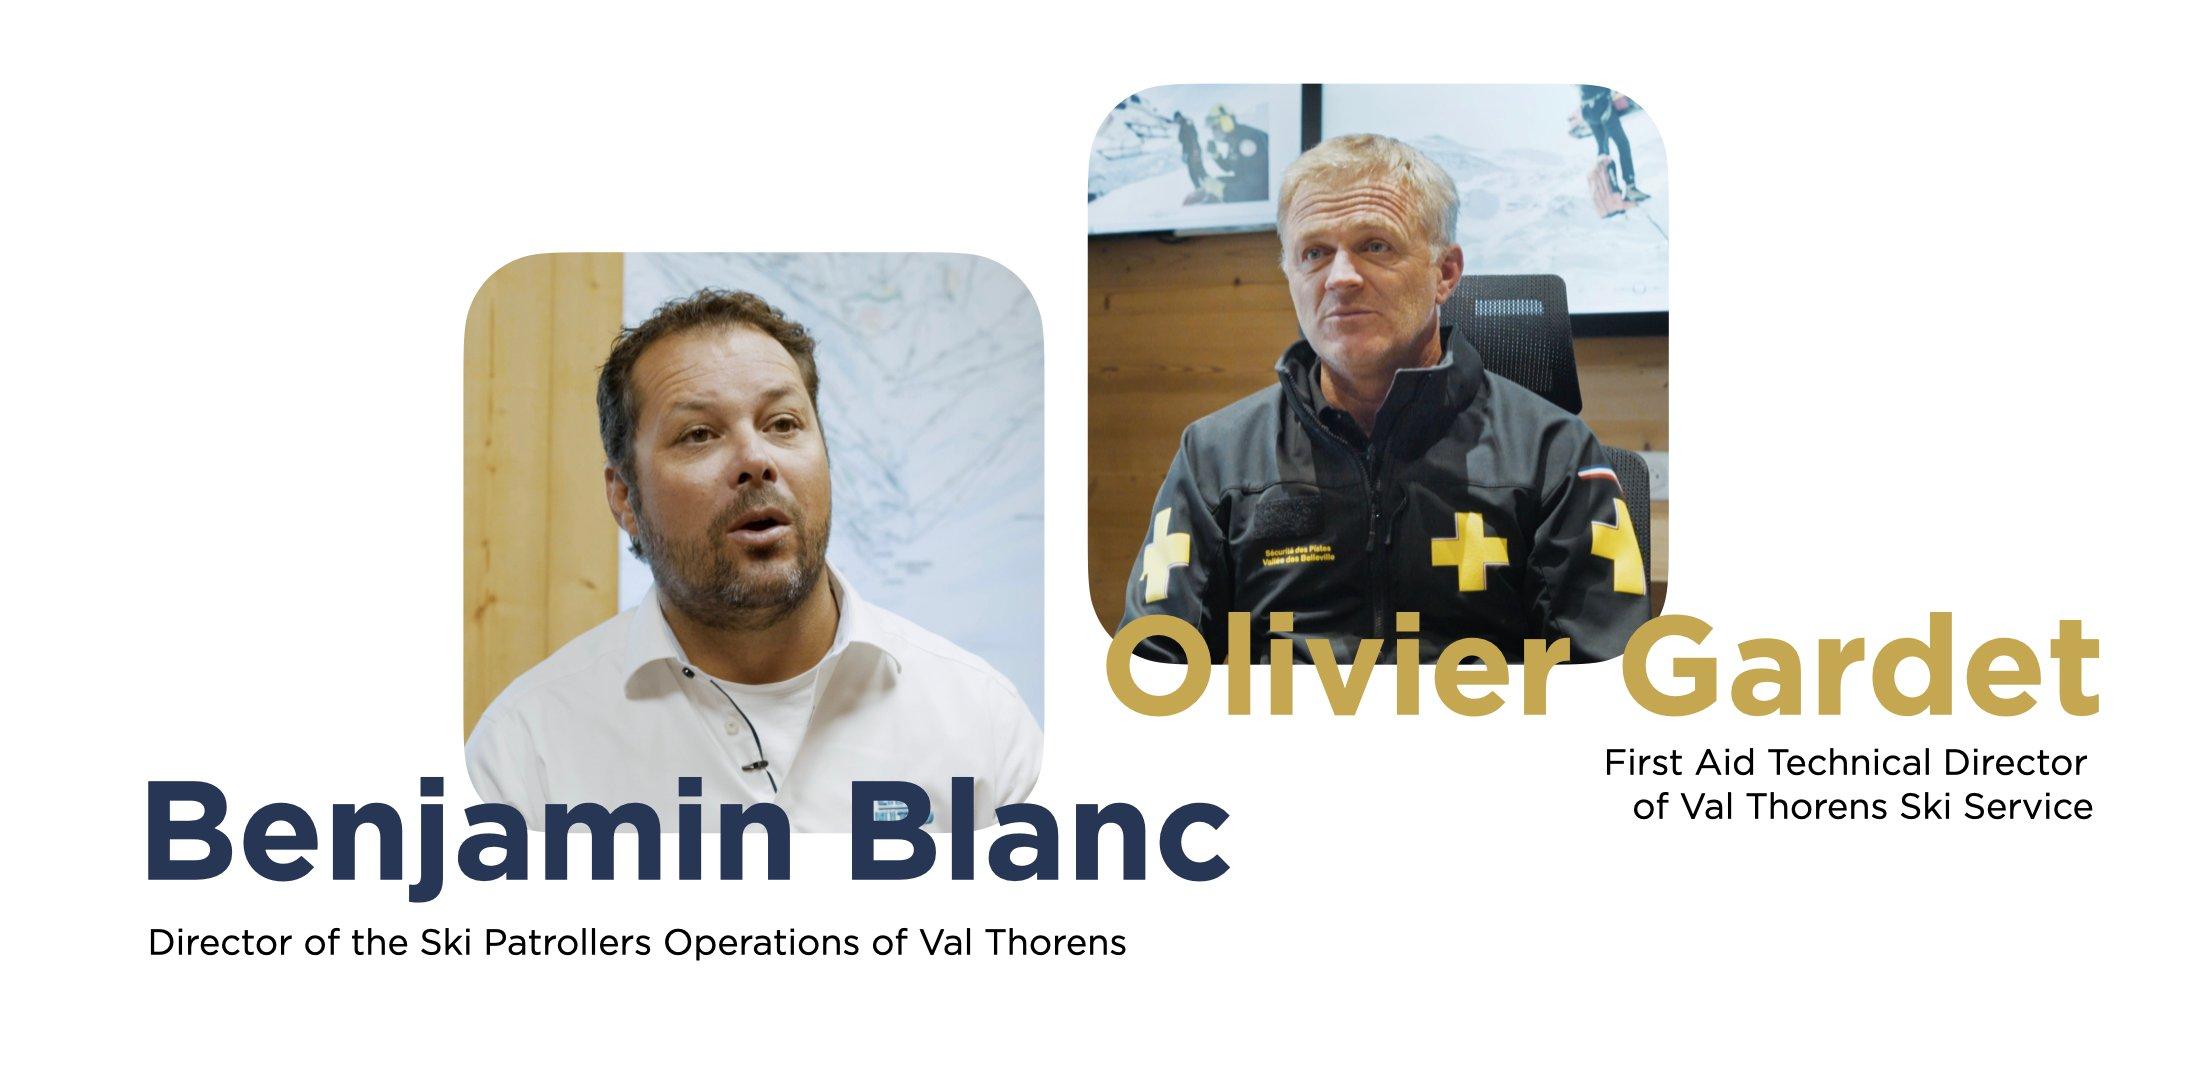 Benjamin Blanc and Olivier Gardet Drone Team